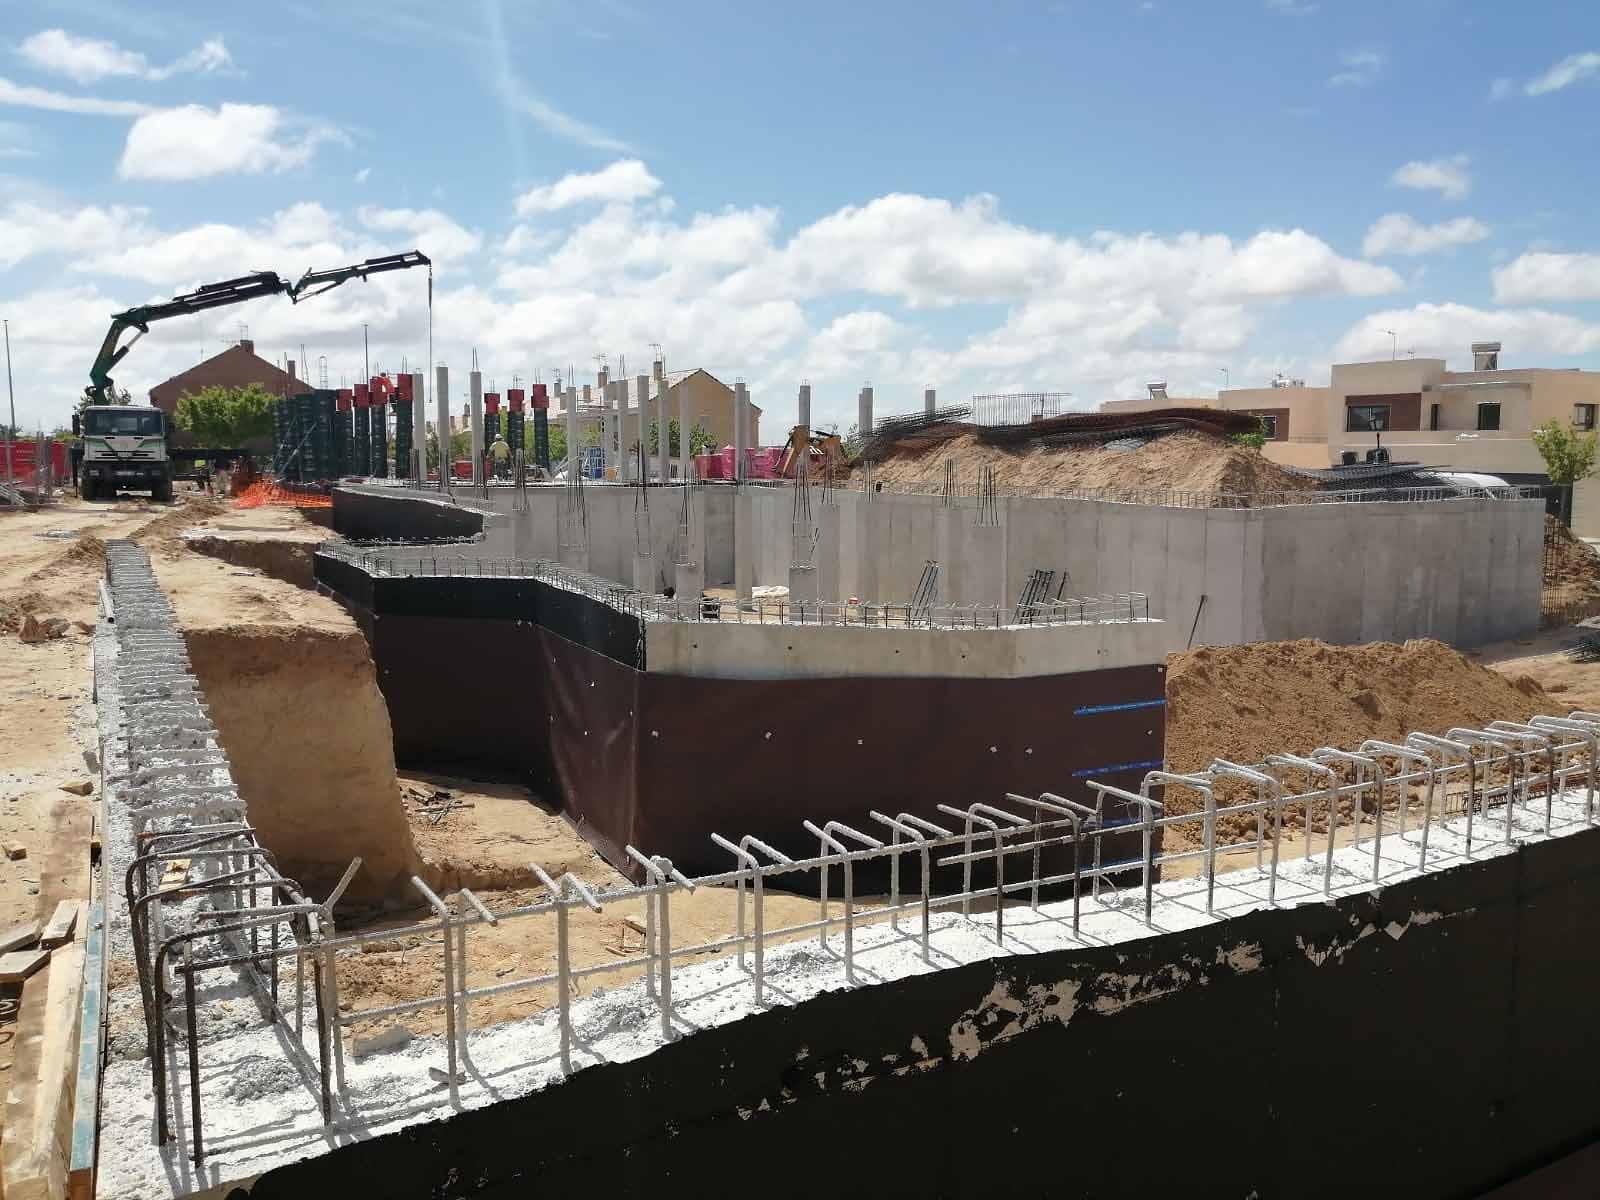 003 Obra construccion casa arrollomolinos madrid